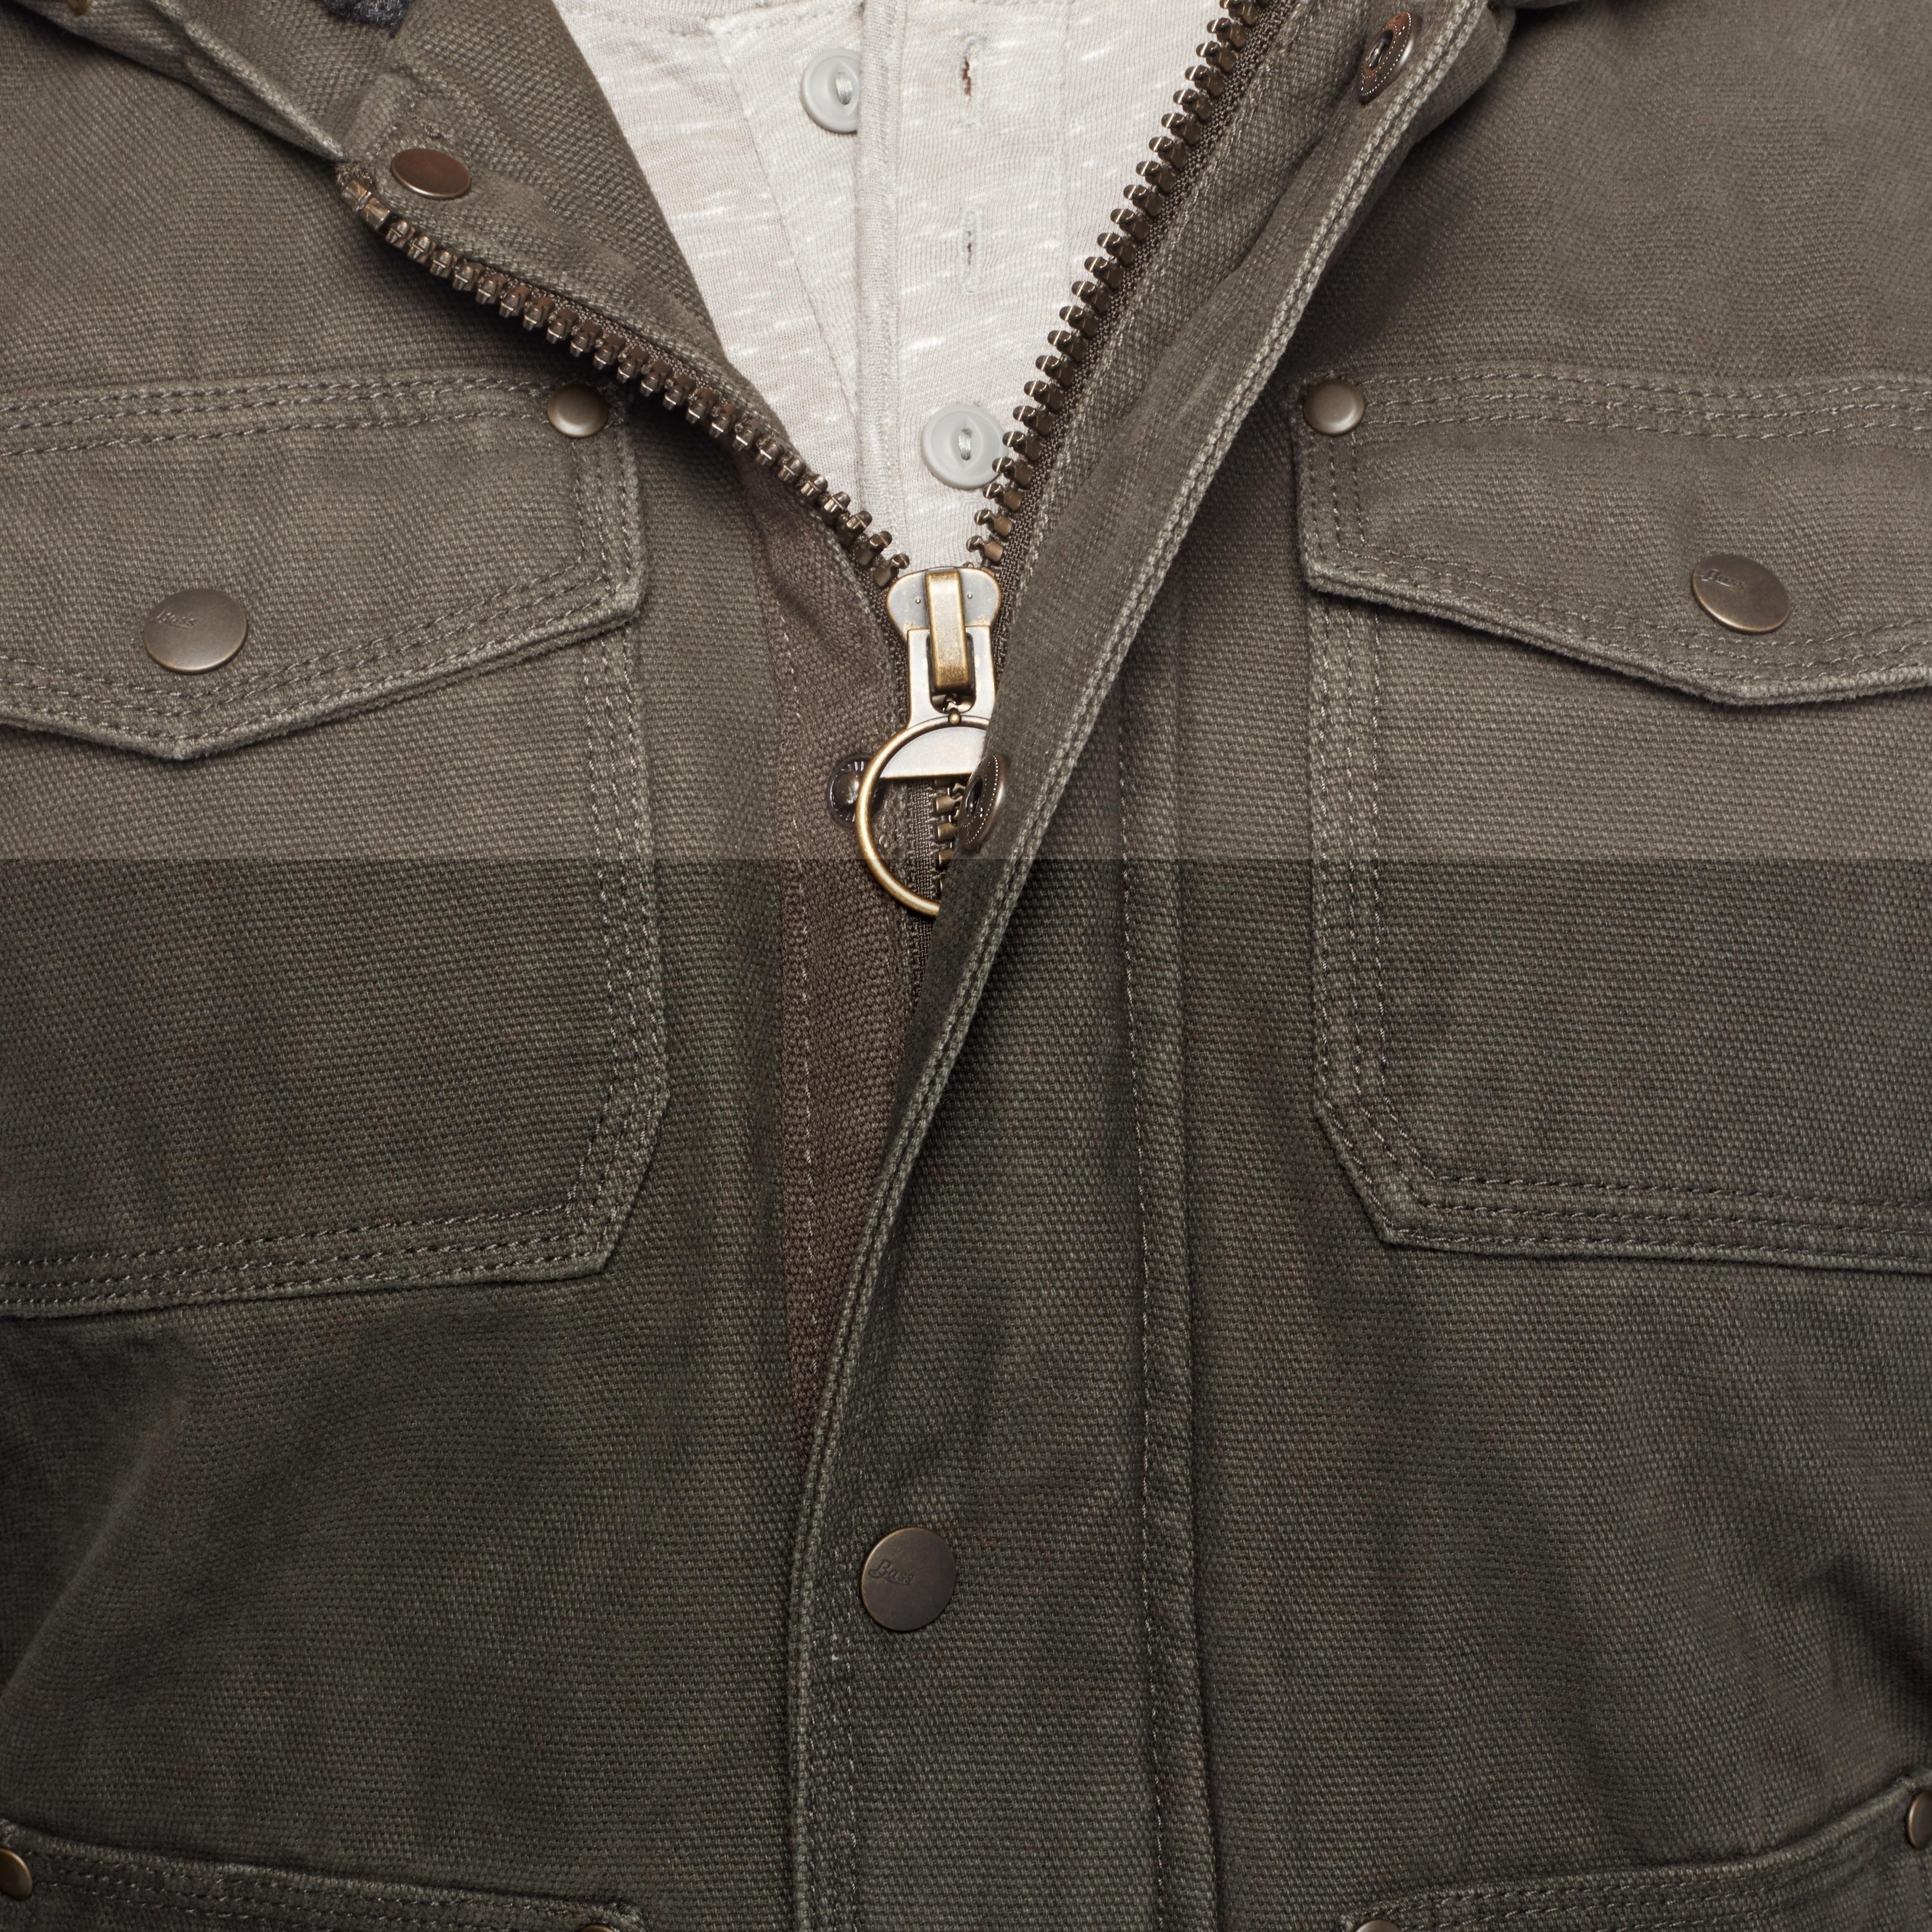 817ef3e53 GH Bass Men's Sherpa Lined Hoodie Jacket